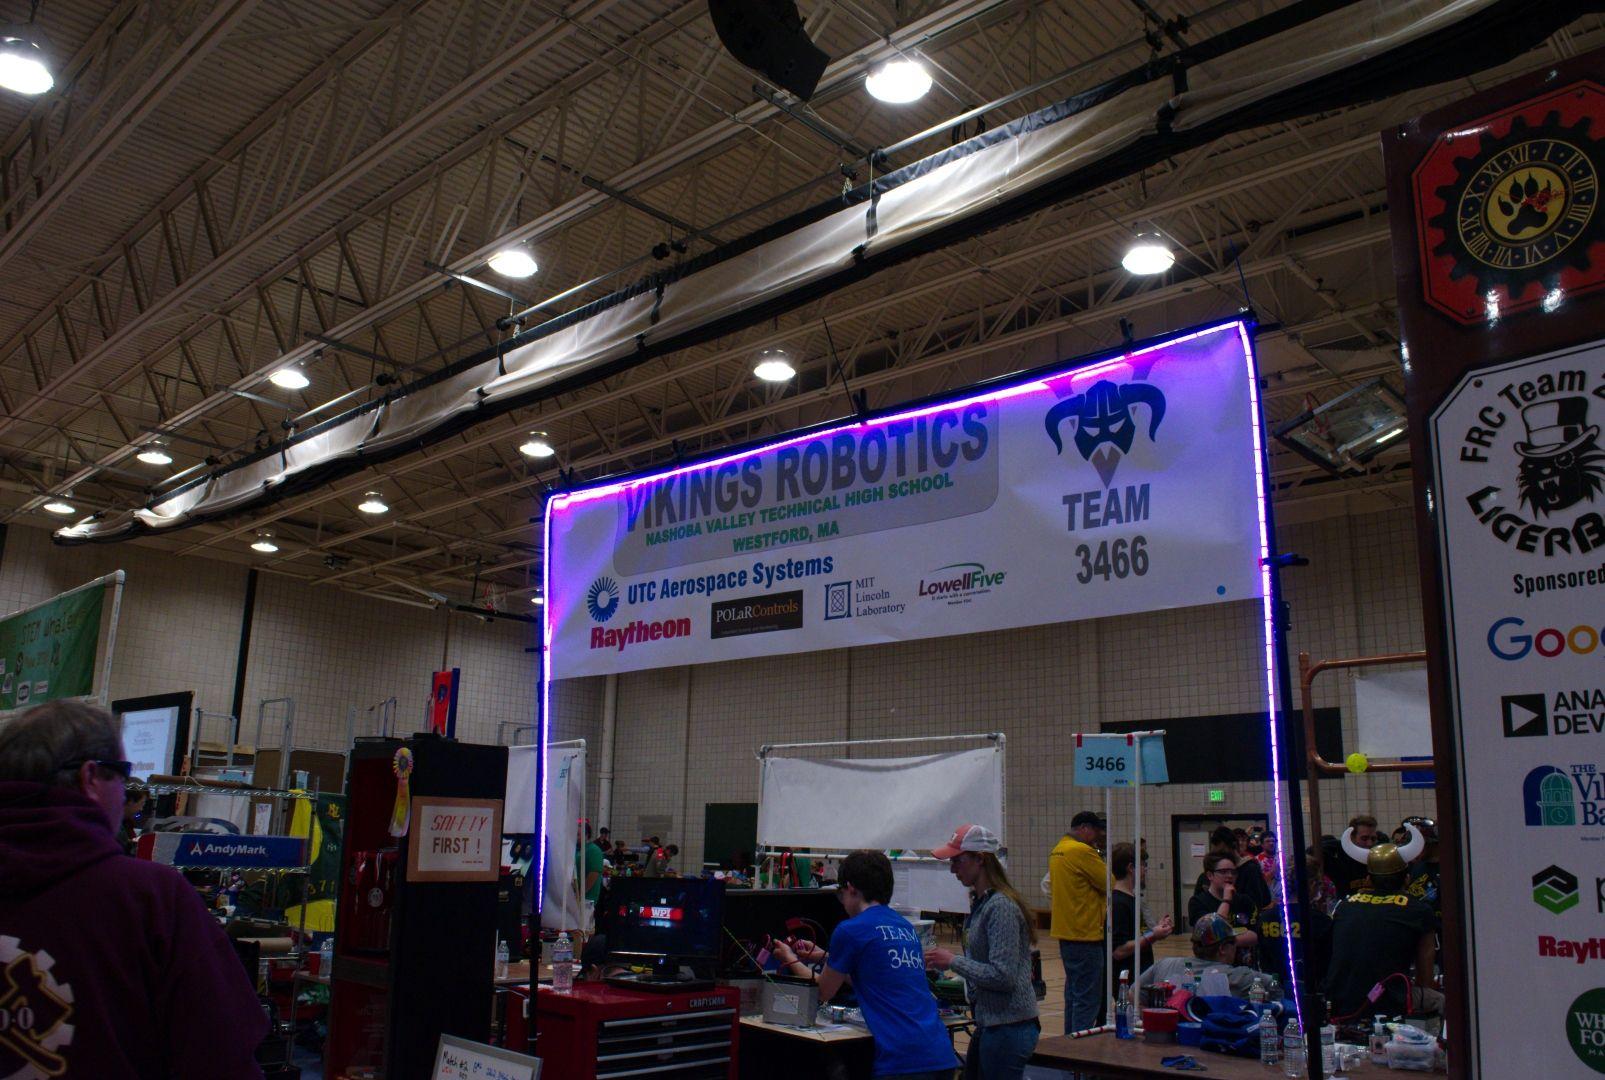 027.2017 Rhode Island District First Robotics Competition